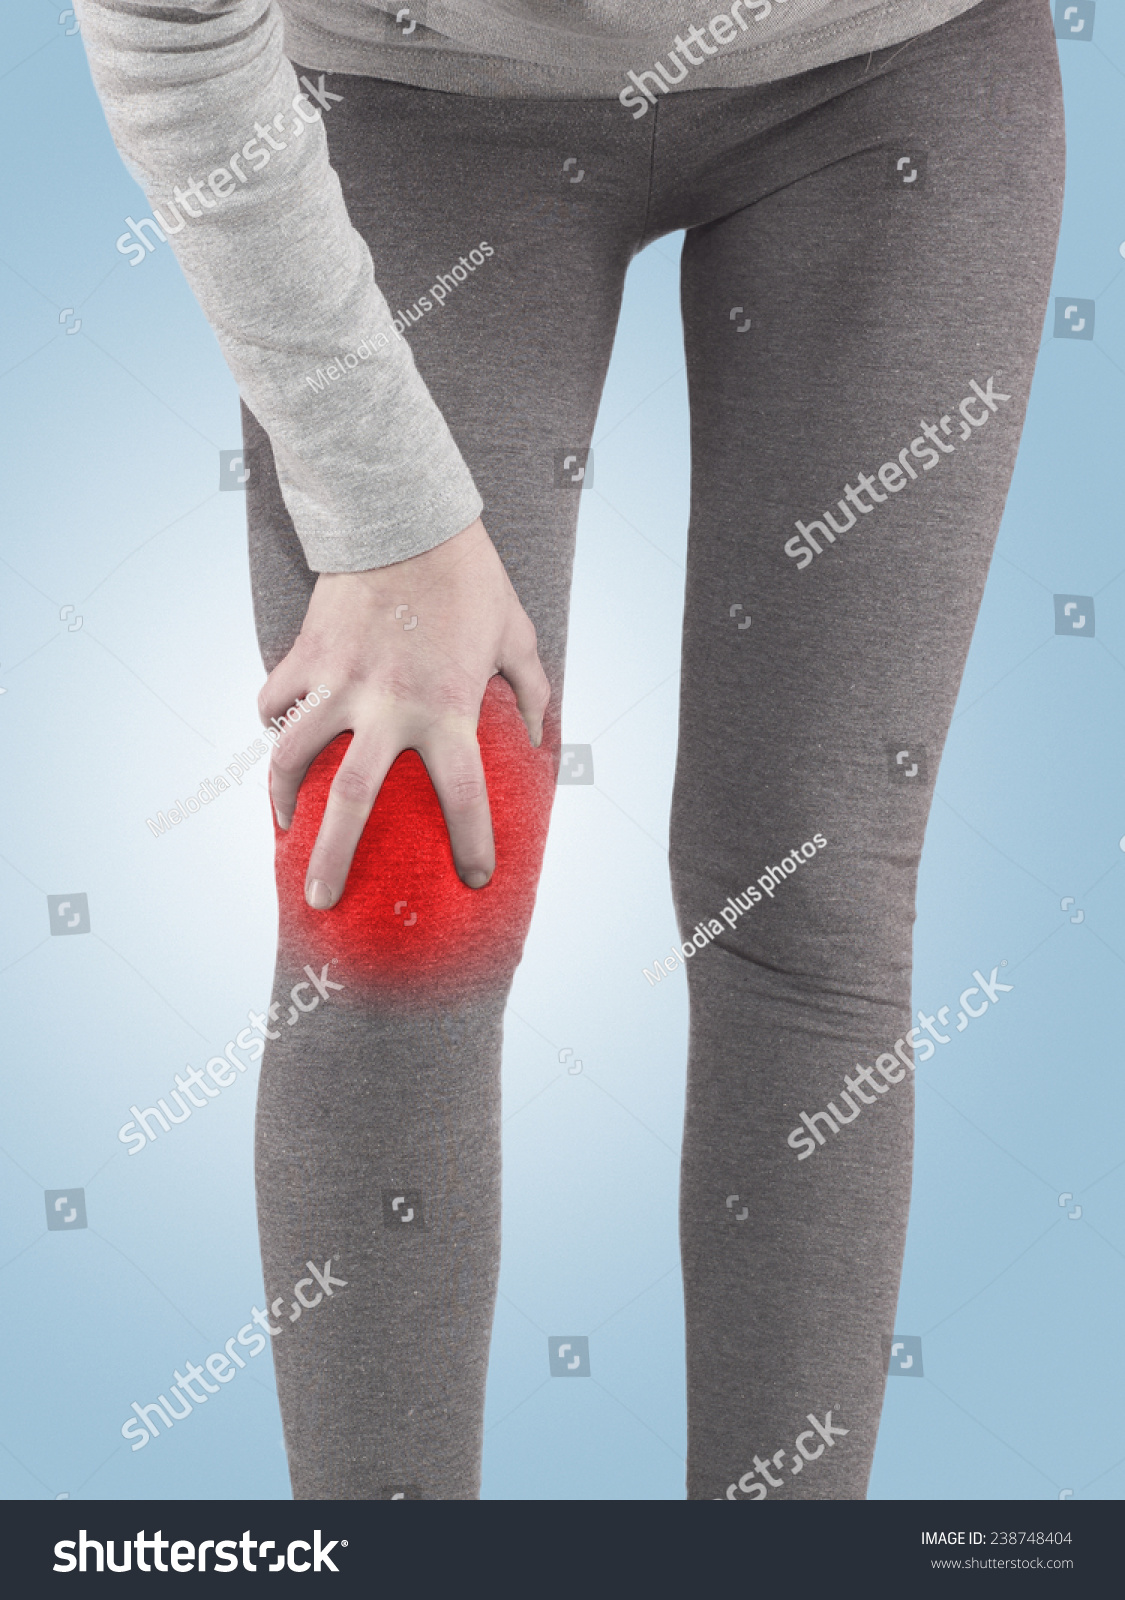 Human Knee Pain Anatomy Injury Caused Stock Photo (Royalty Free ...